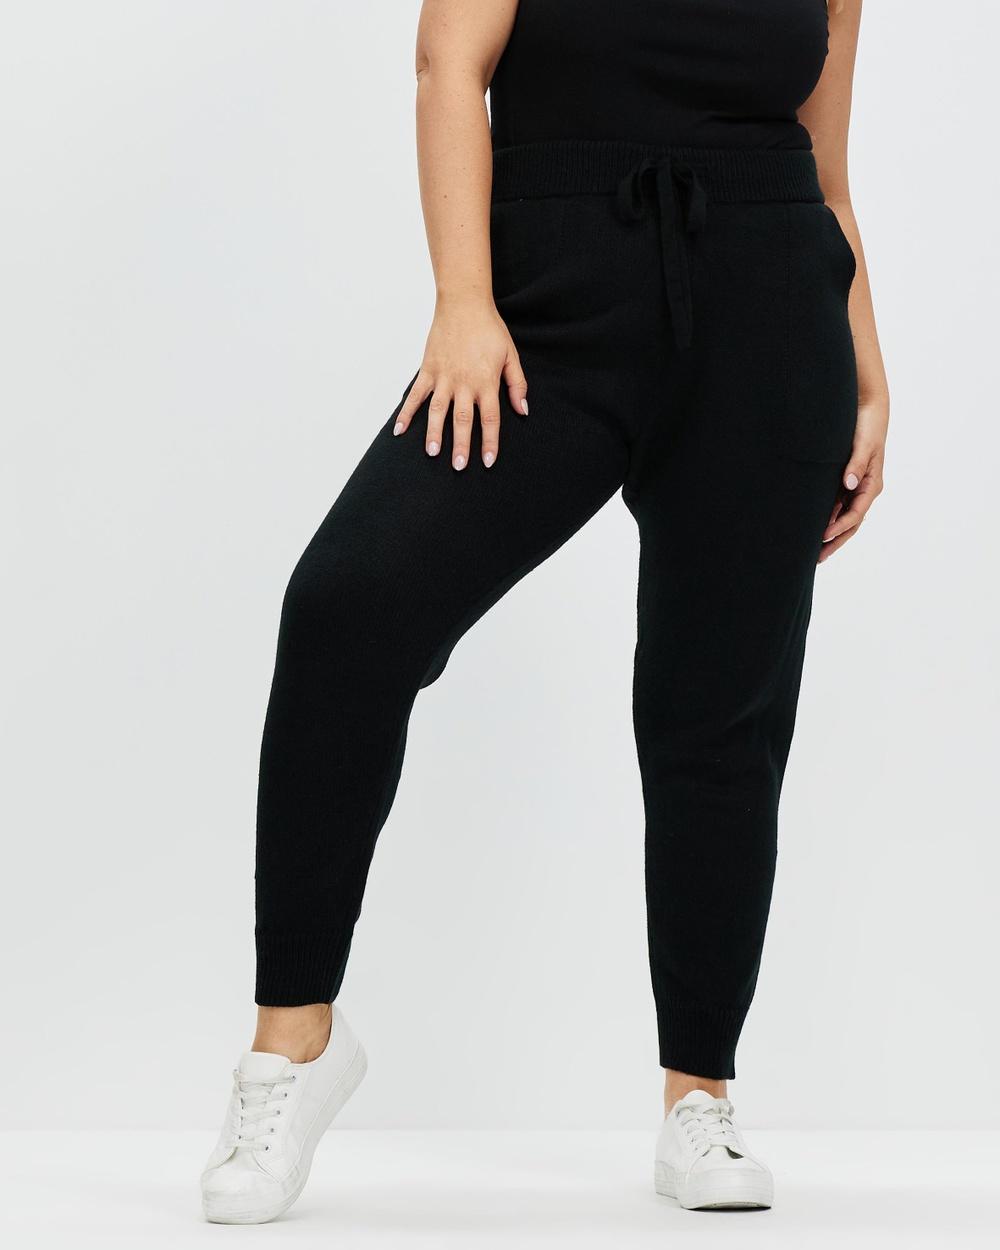 Atmos&Here Curvy Savannah Knitted Pants Black Australia